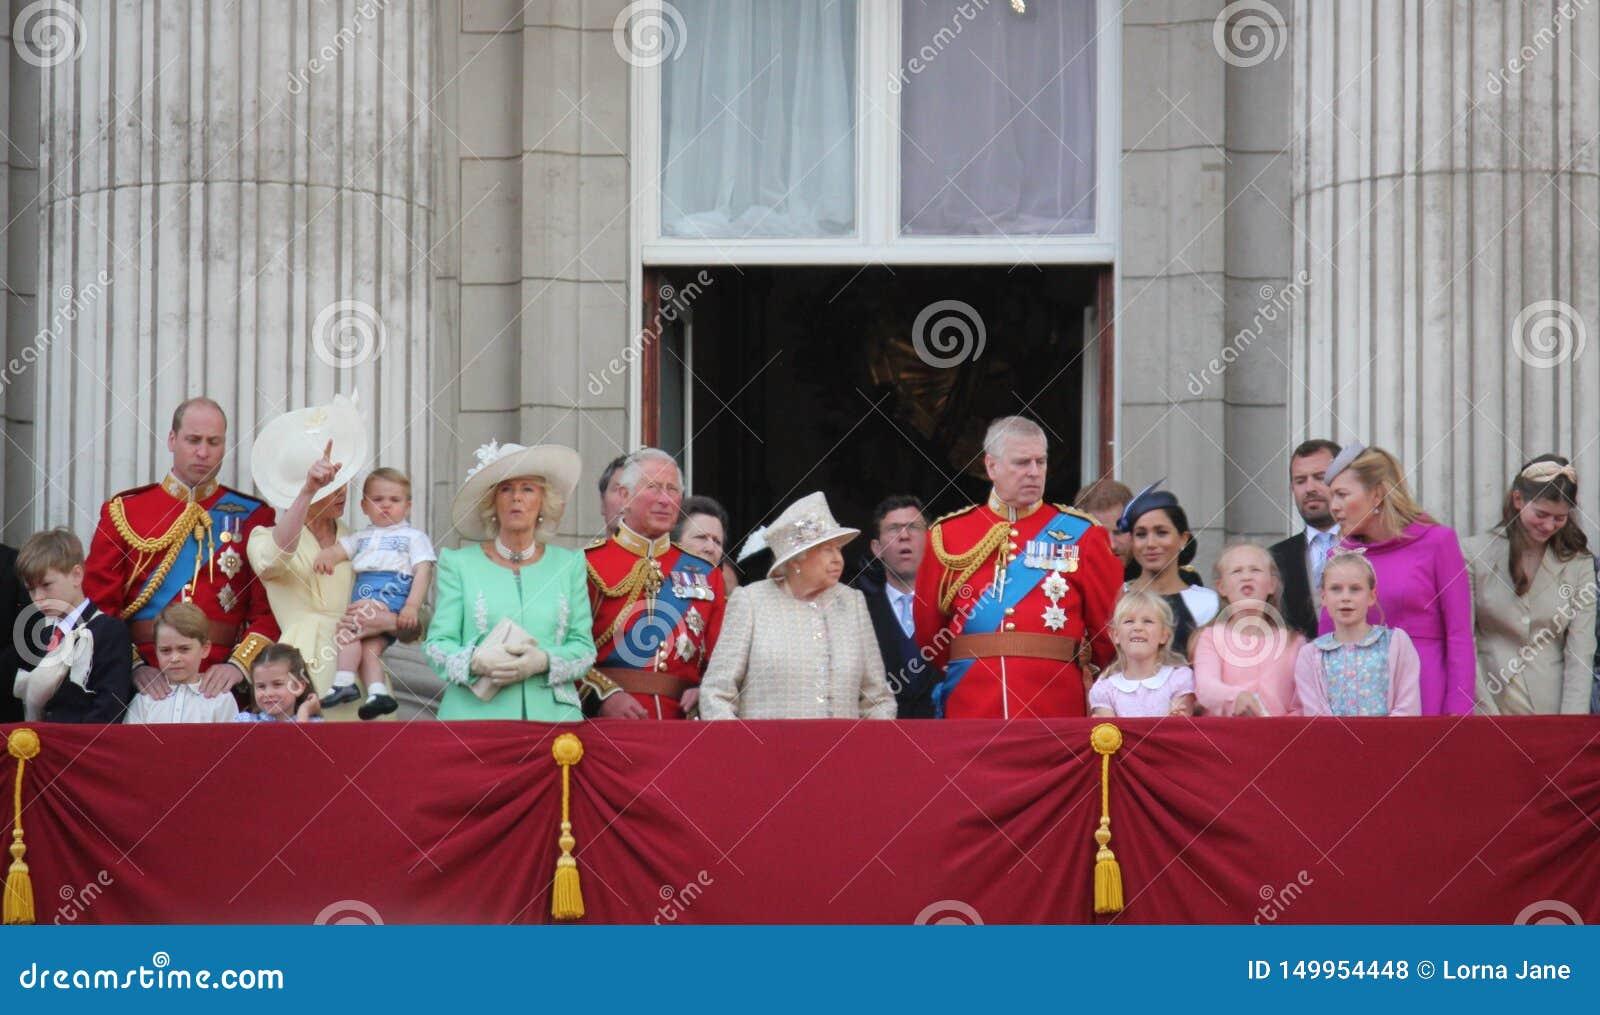 La Reine Elizabeth London R-U le 8 juin 2019 - Meghan Markle Prince Harry George William Charles Kate Middleton